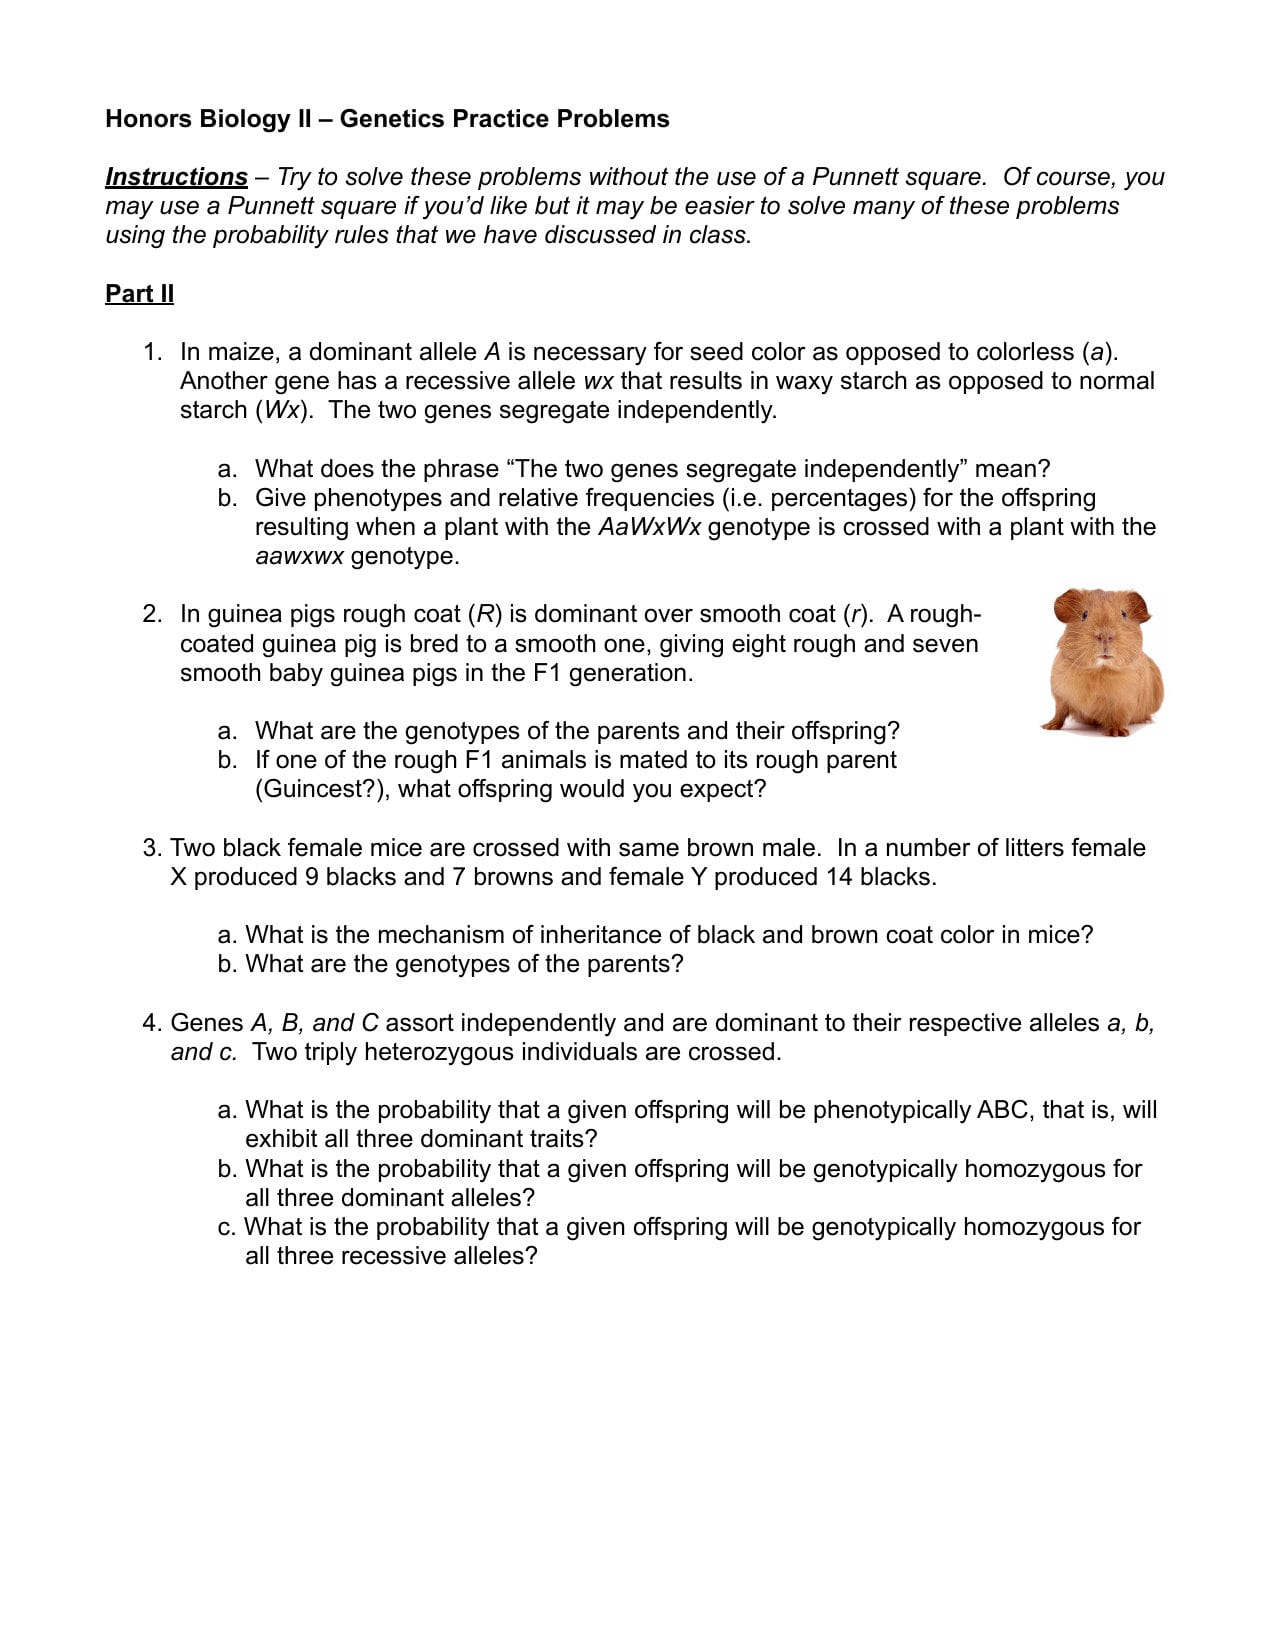 Genetics Practice Problems Worksheet Key